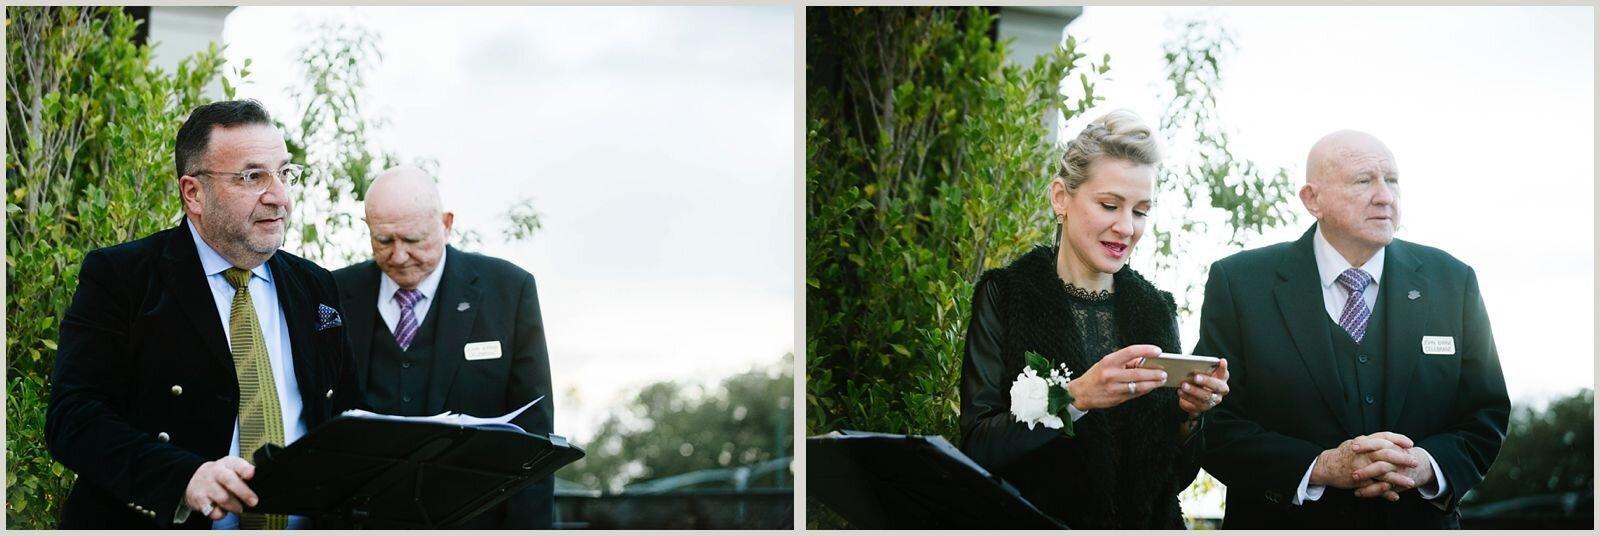 joseph_koprek_wedding_melbourne_the_prince_deck_0056.jpg